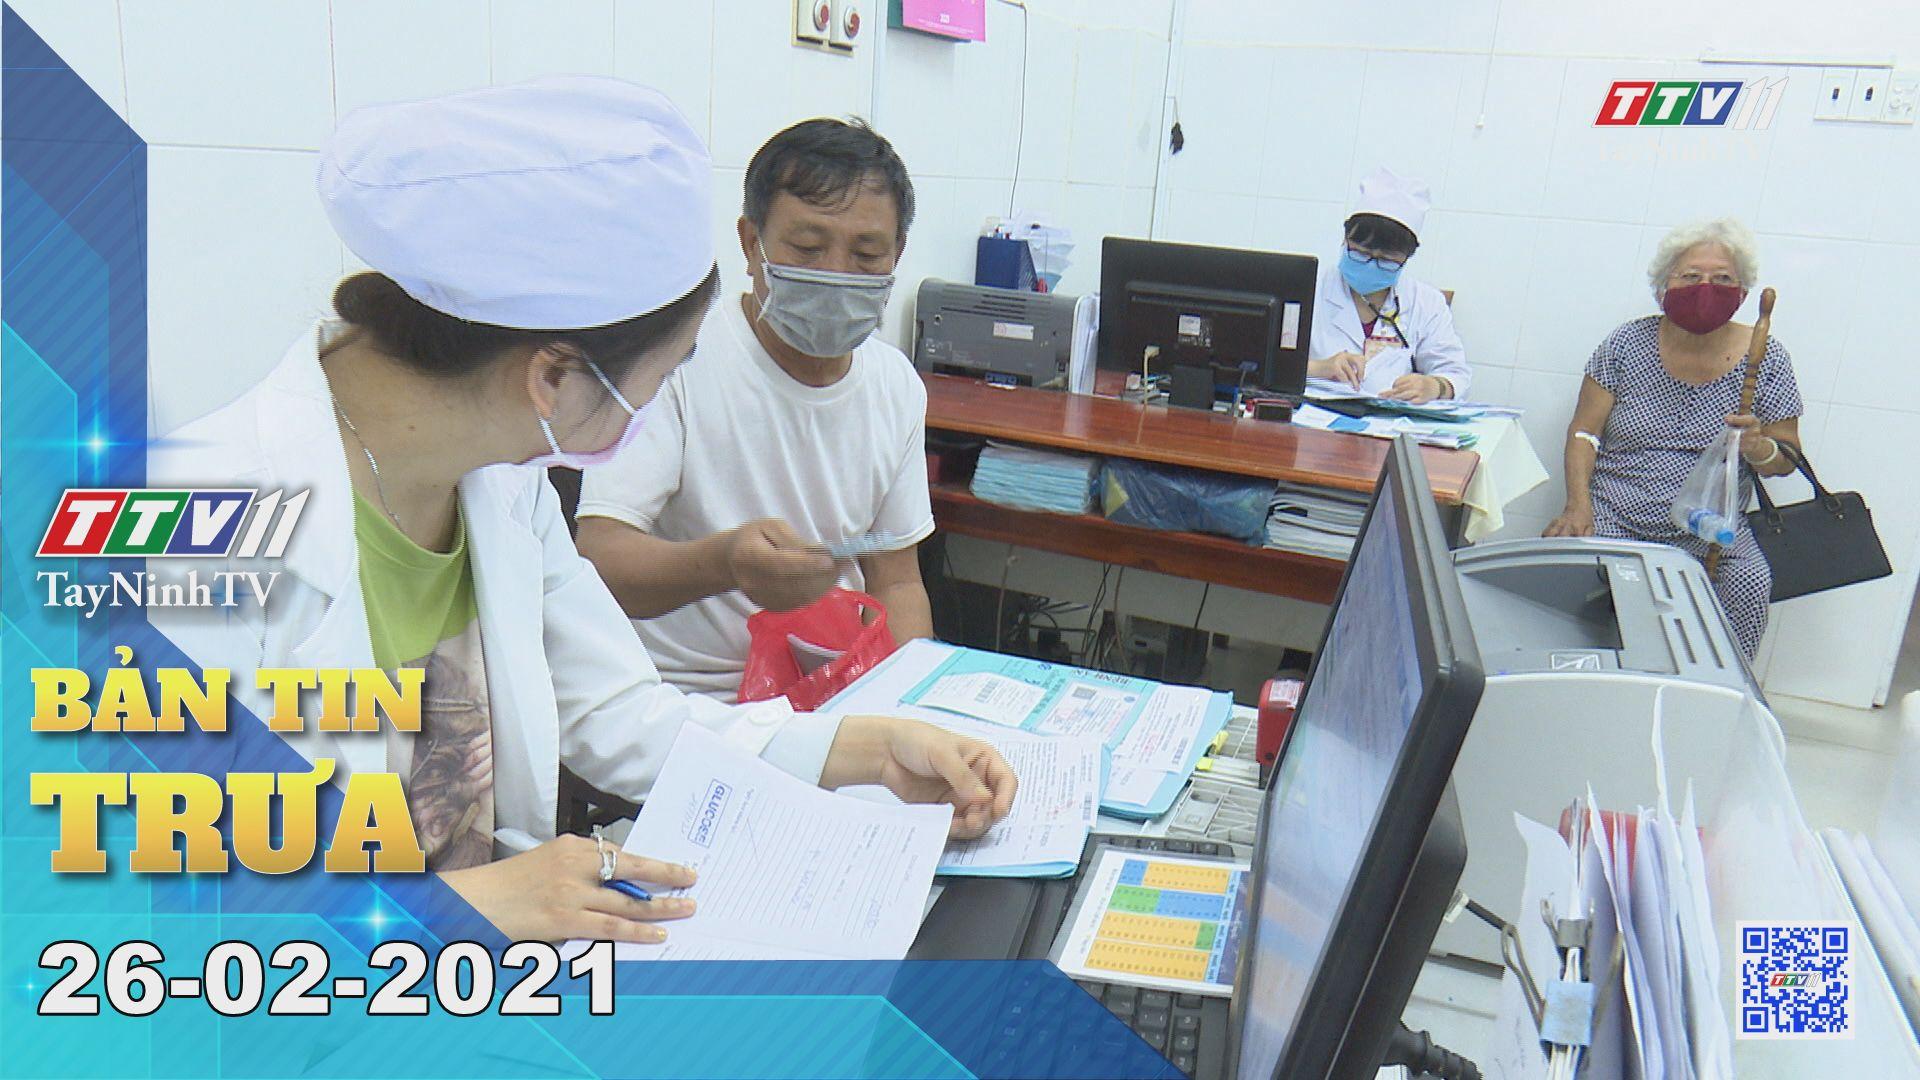 Bản tin trưa 26-02-2021 | Tin tức hôm nay | TayNinhTV